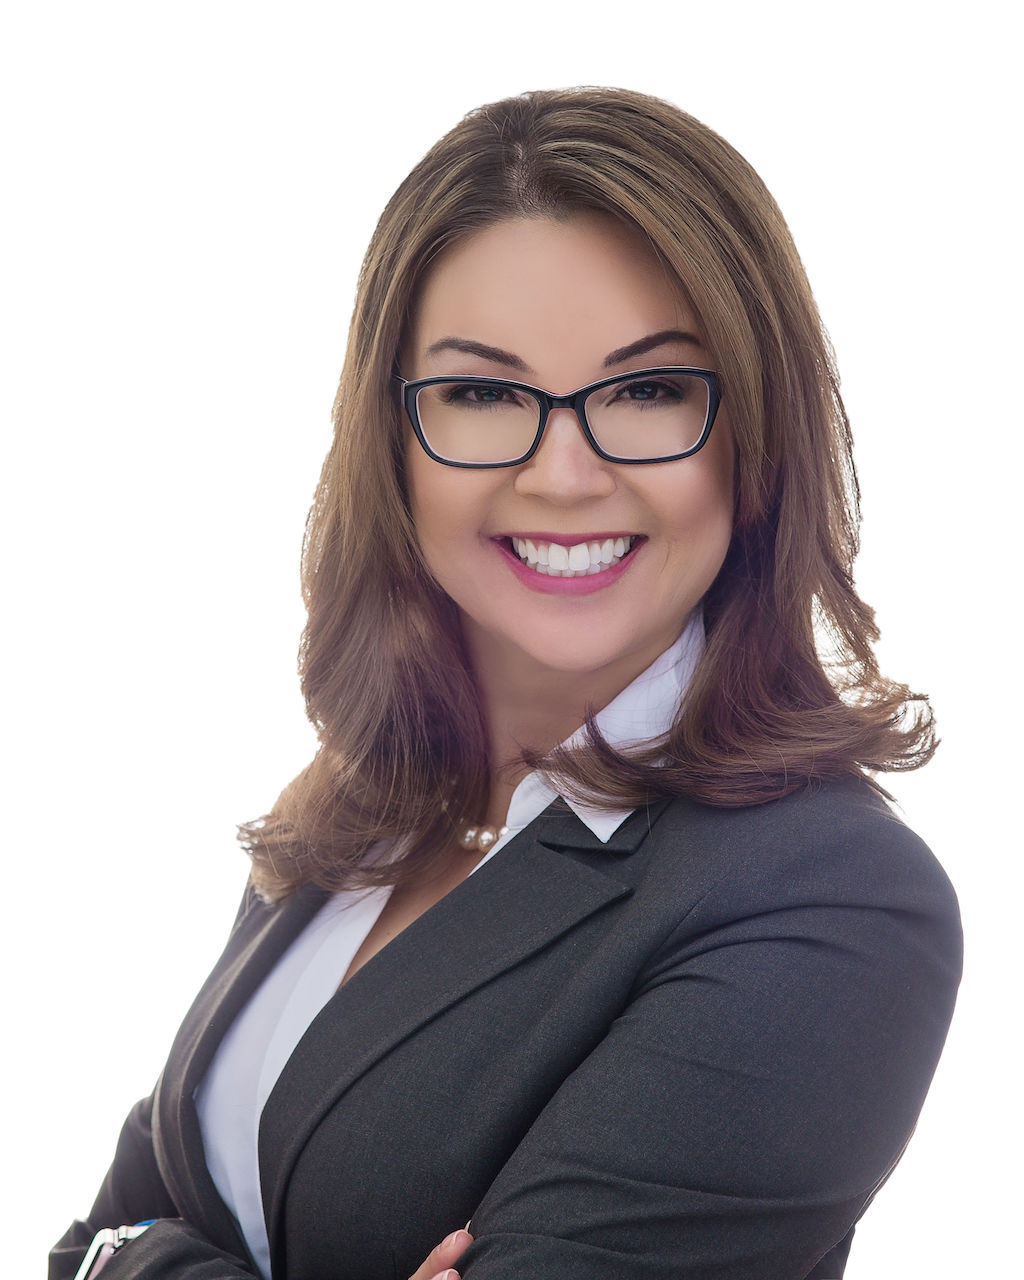 Amy M. Hamilton